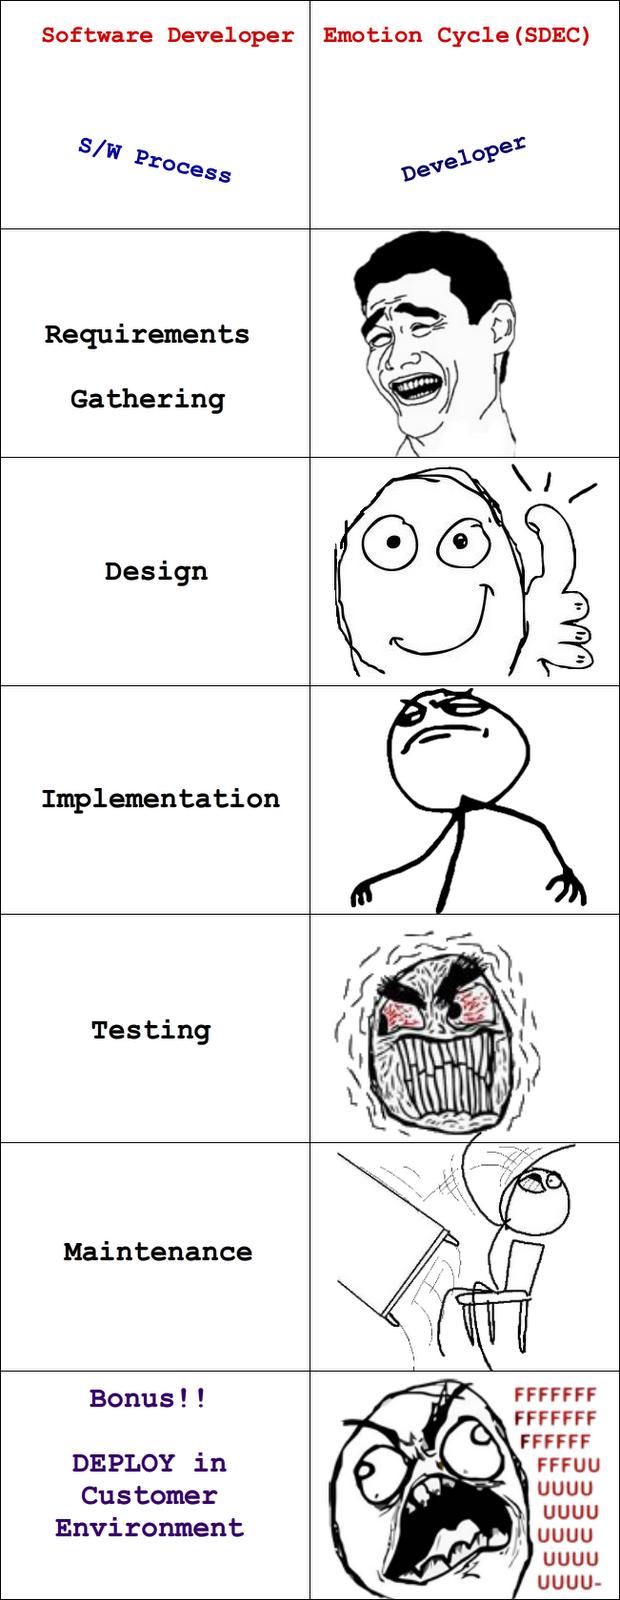 Software Developer Emotion Cycle (SDEC)